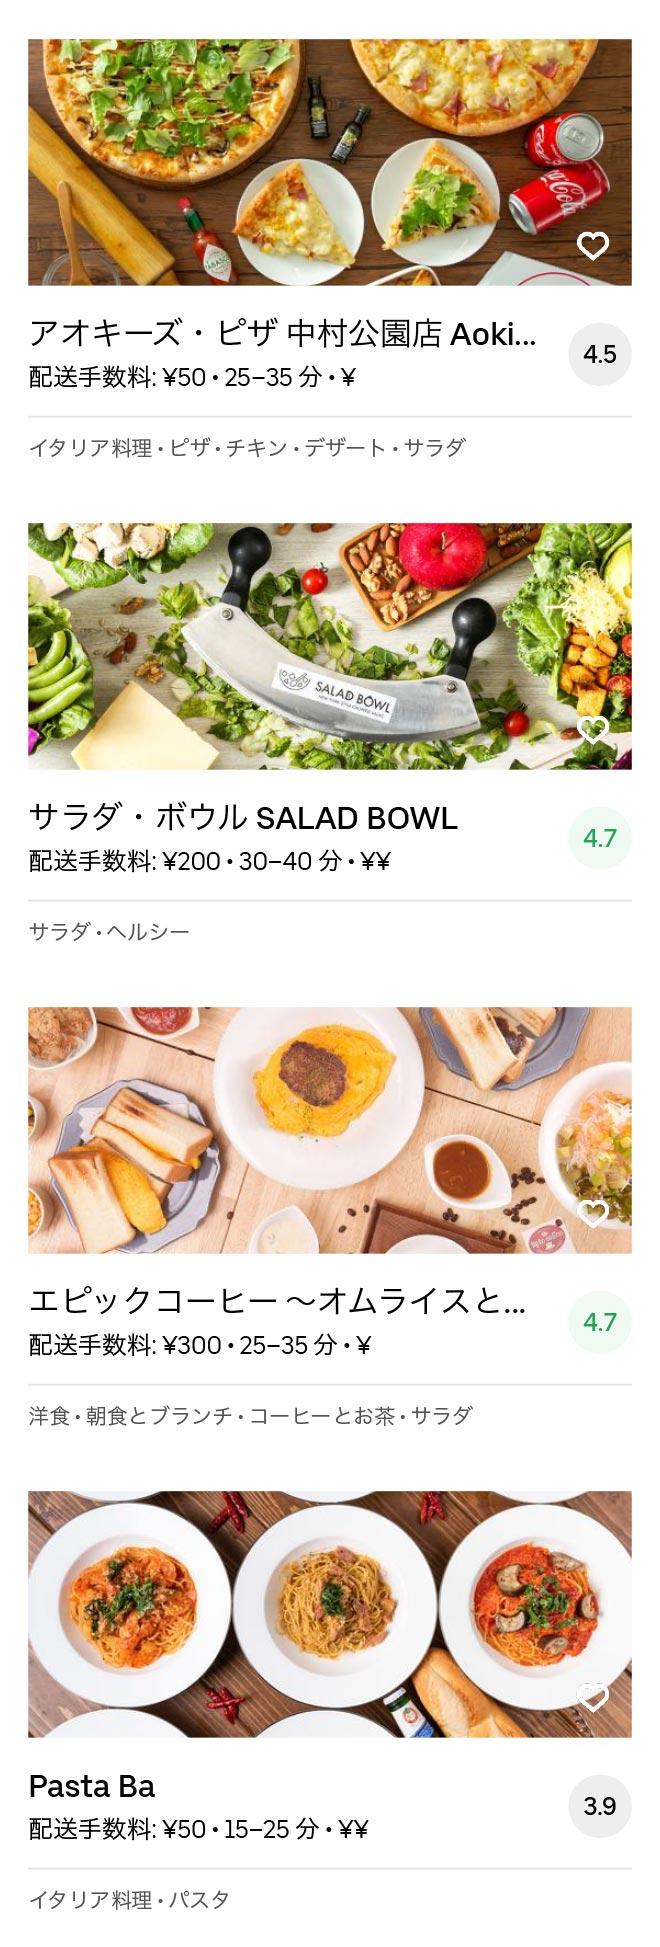 Nagoya nakamura menu 2005 11